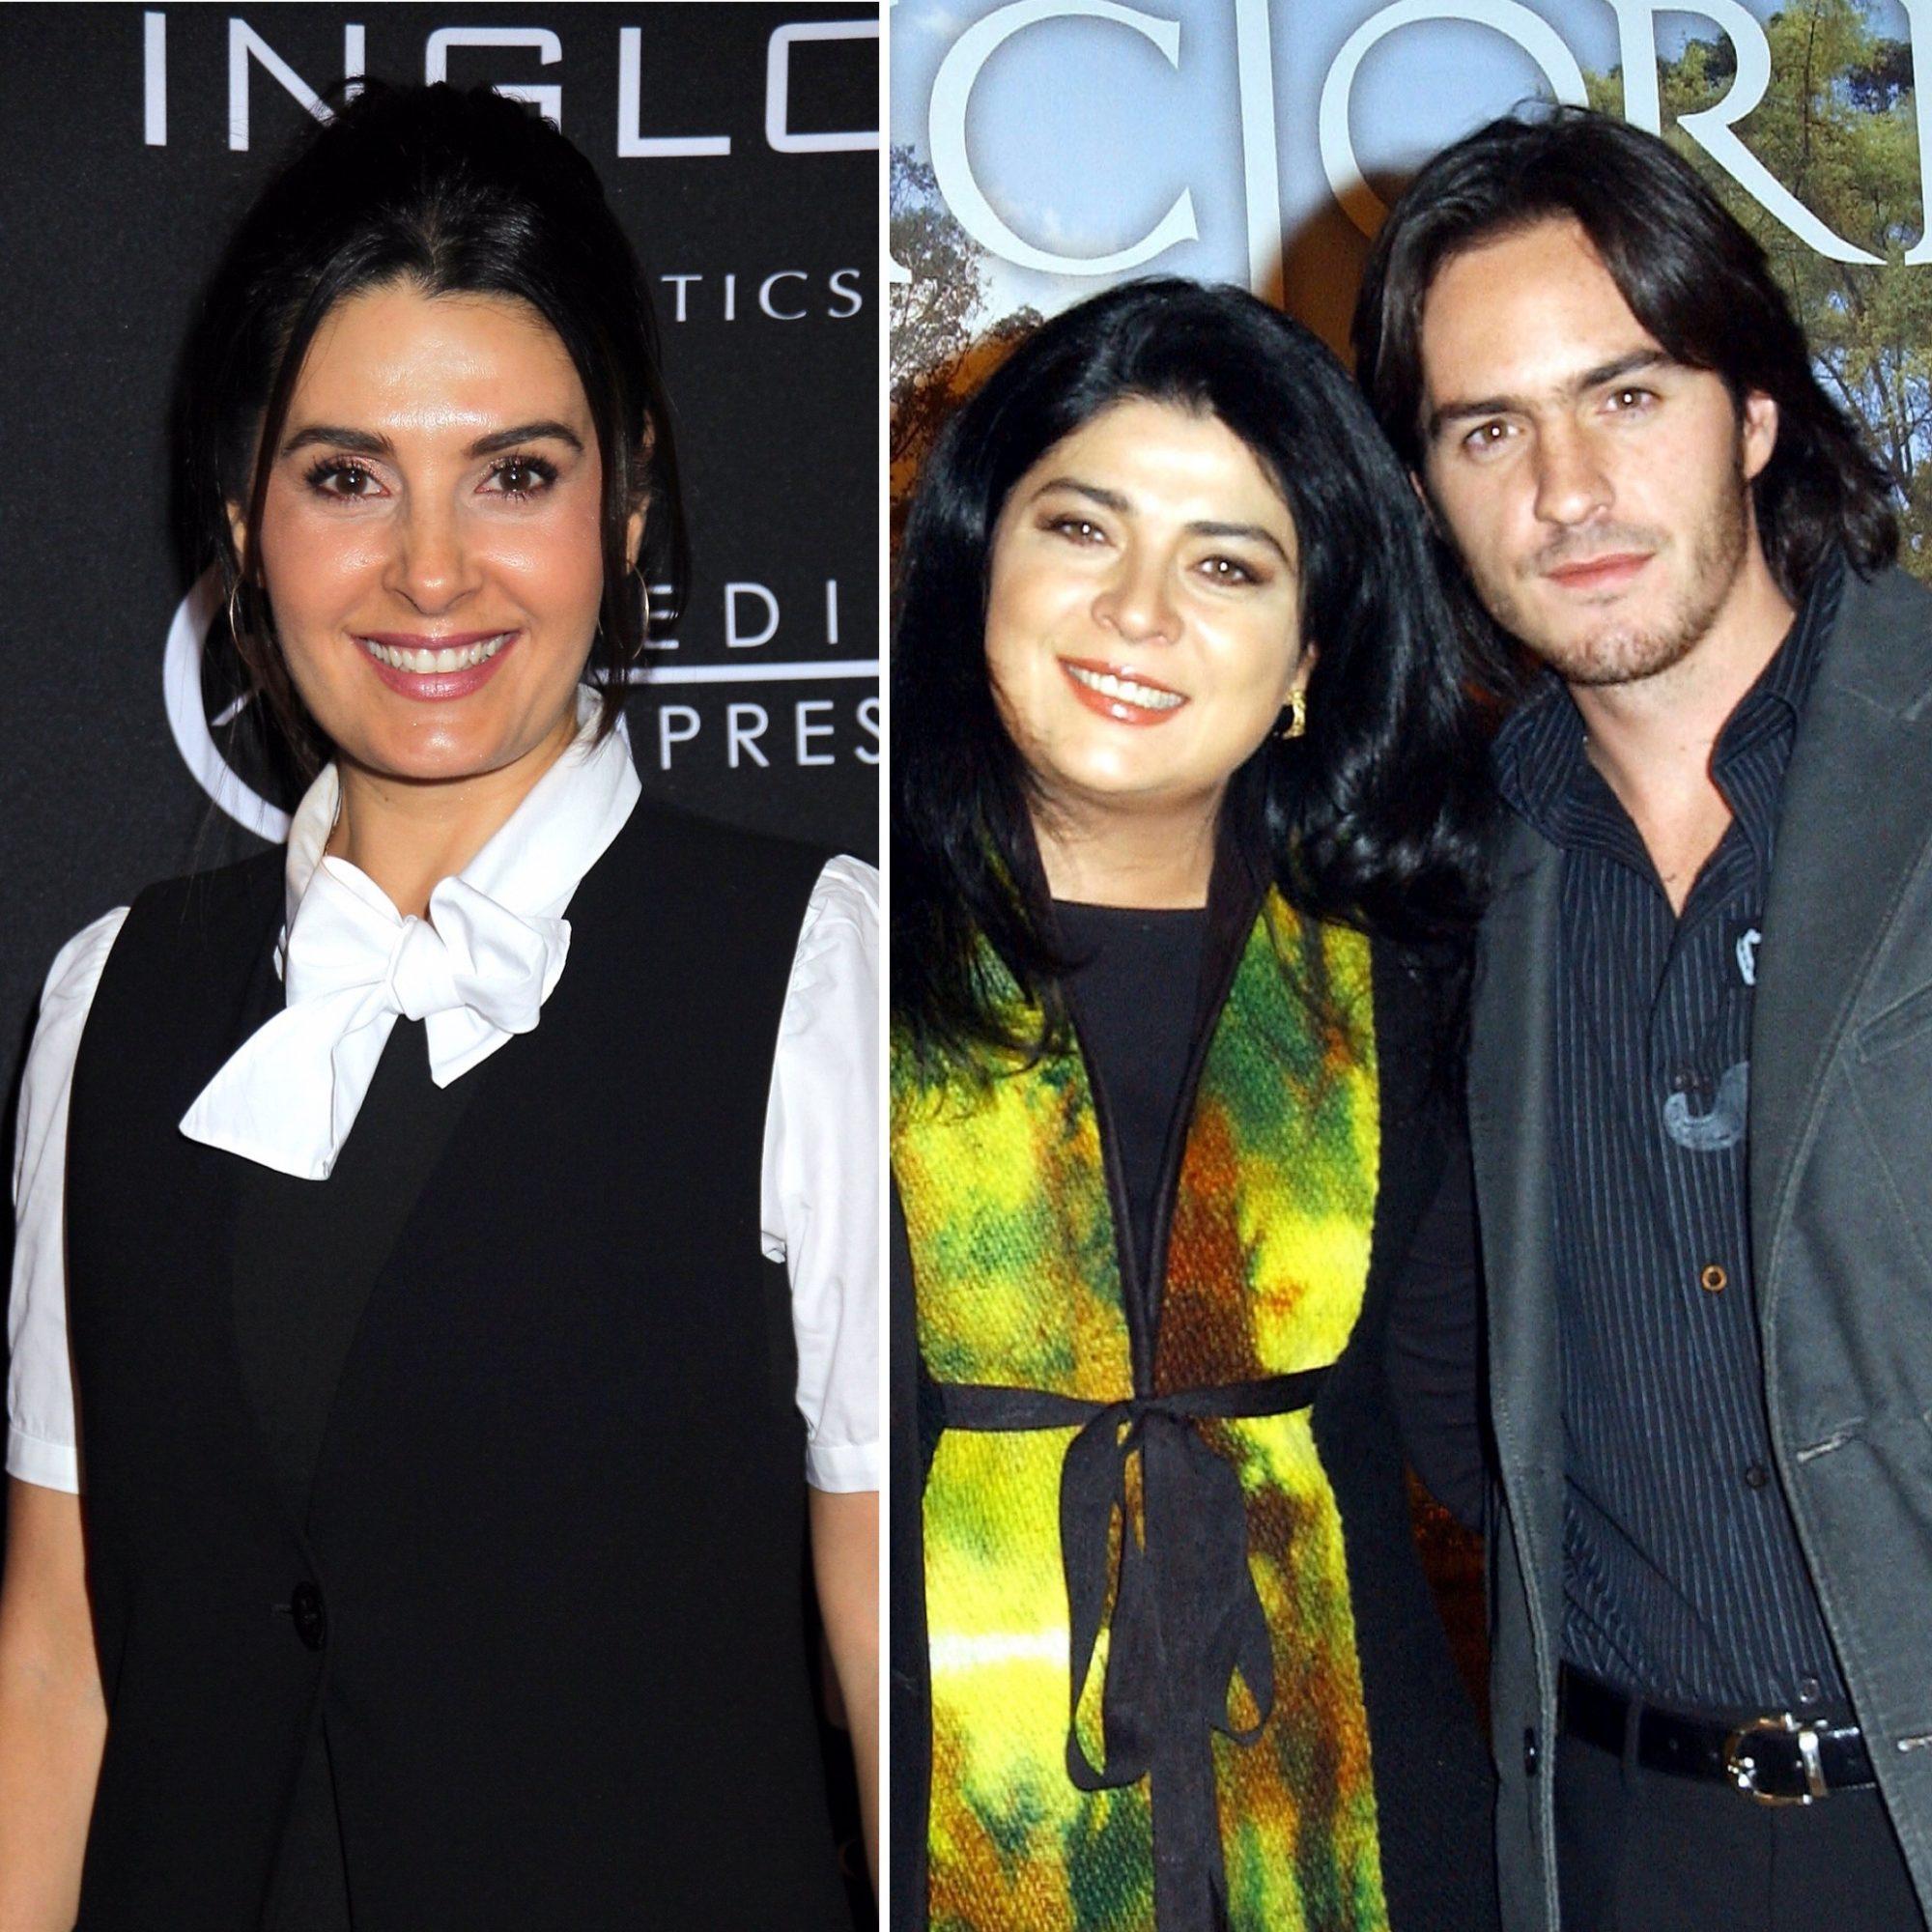 Mayrín Villanueva, Victoria Ruffo y Mauricio Ochmann